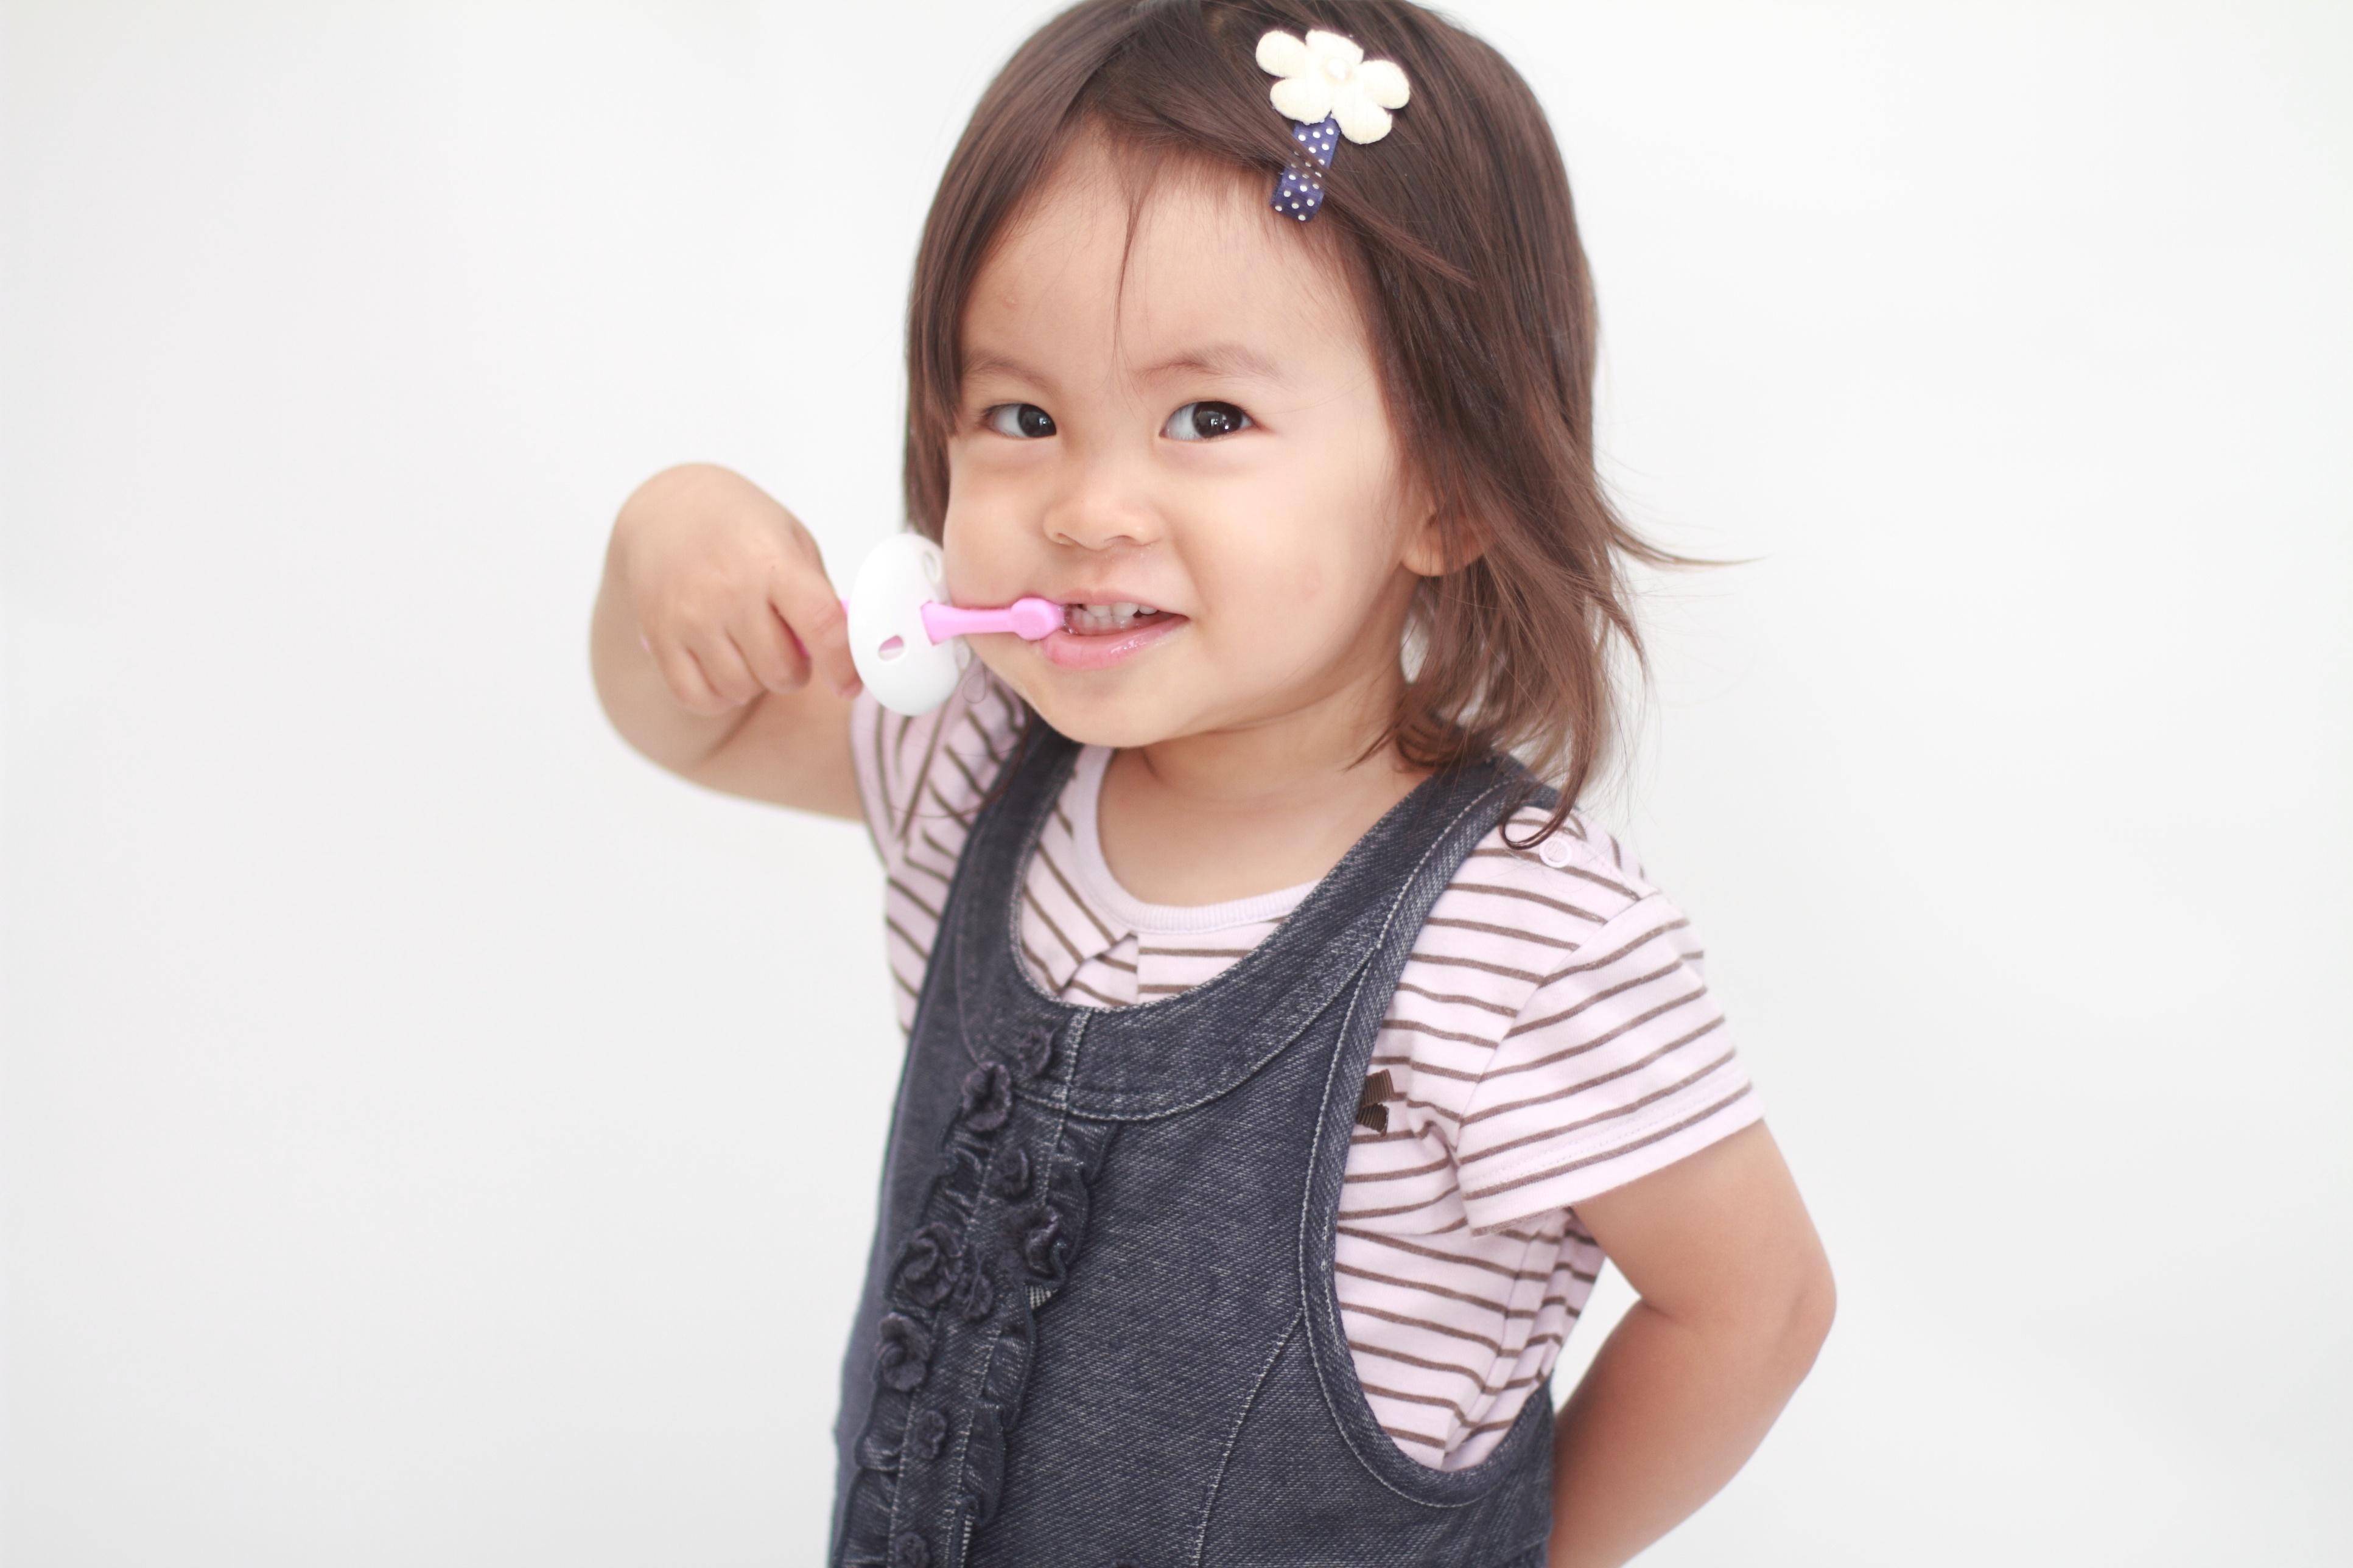 Infant_brushing_teeth.jpg